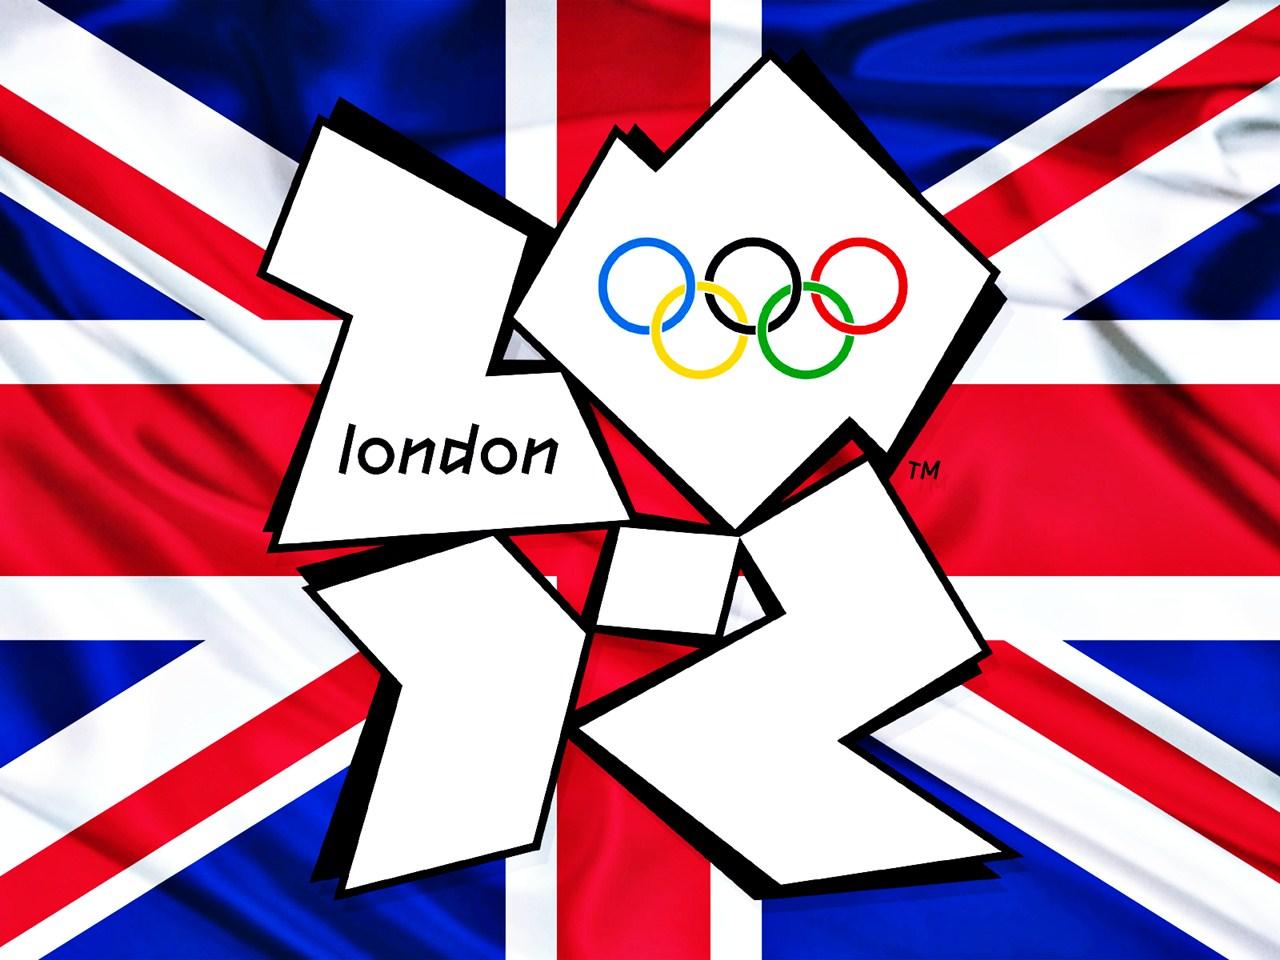 http://4.bp.blogspot.com/-PMZIFArFMK8/UCkVOszDtCI/AAAAAAAAECM/-441S0C9LC0/s1600/london-2012-olympic-games.jpg